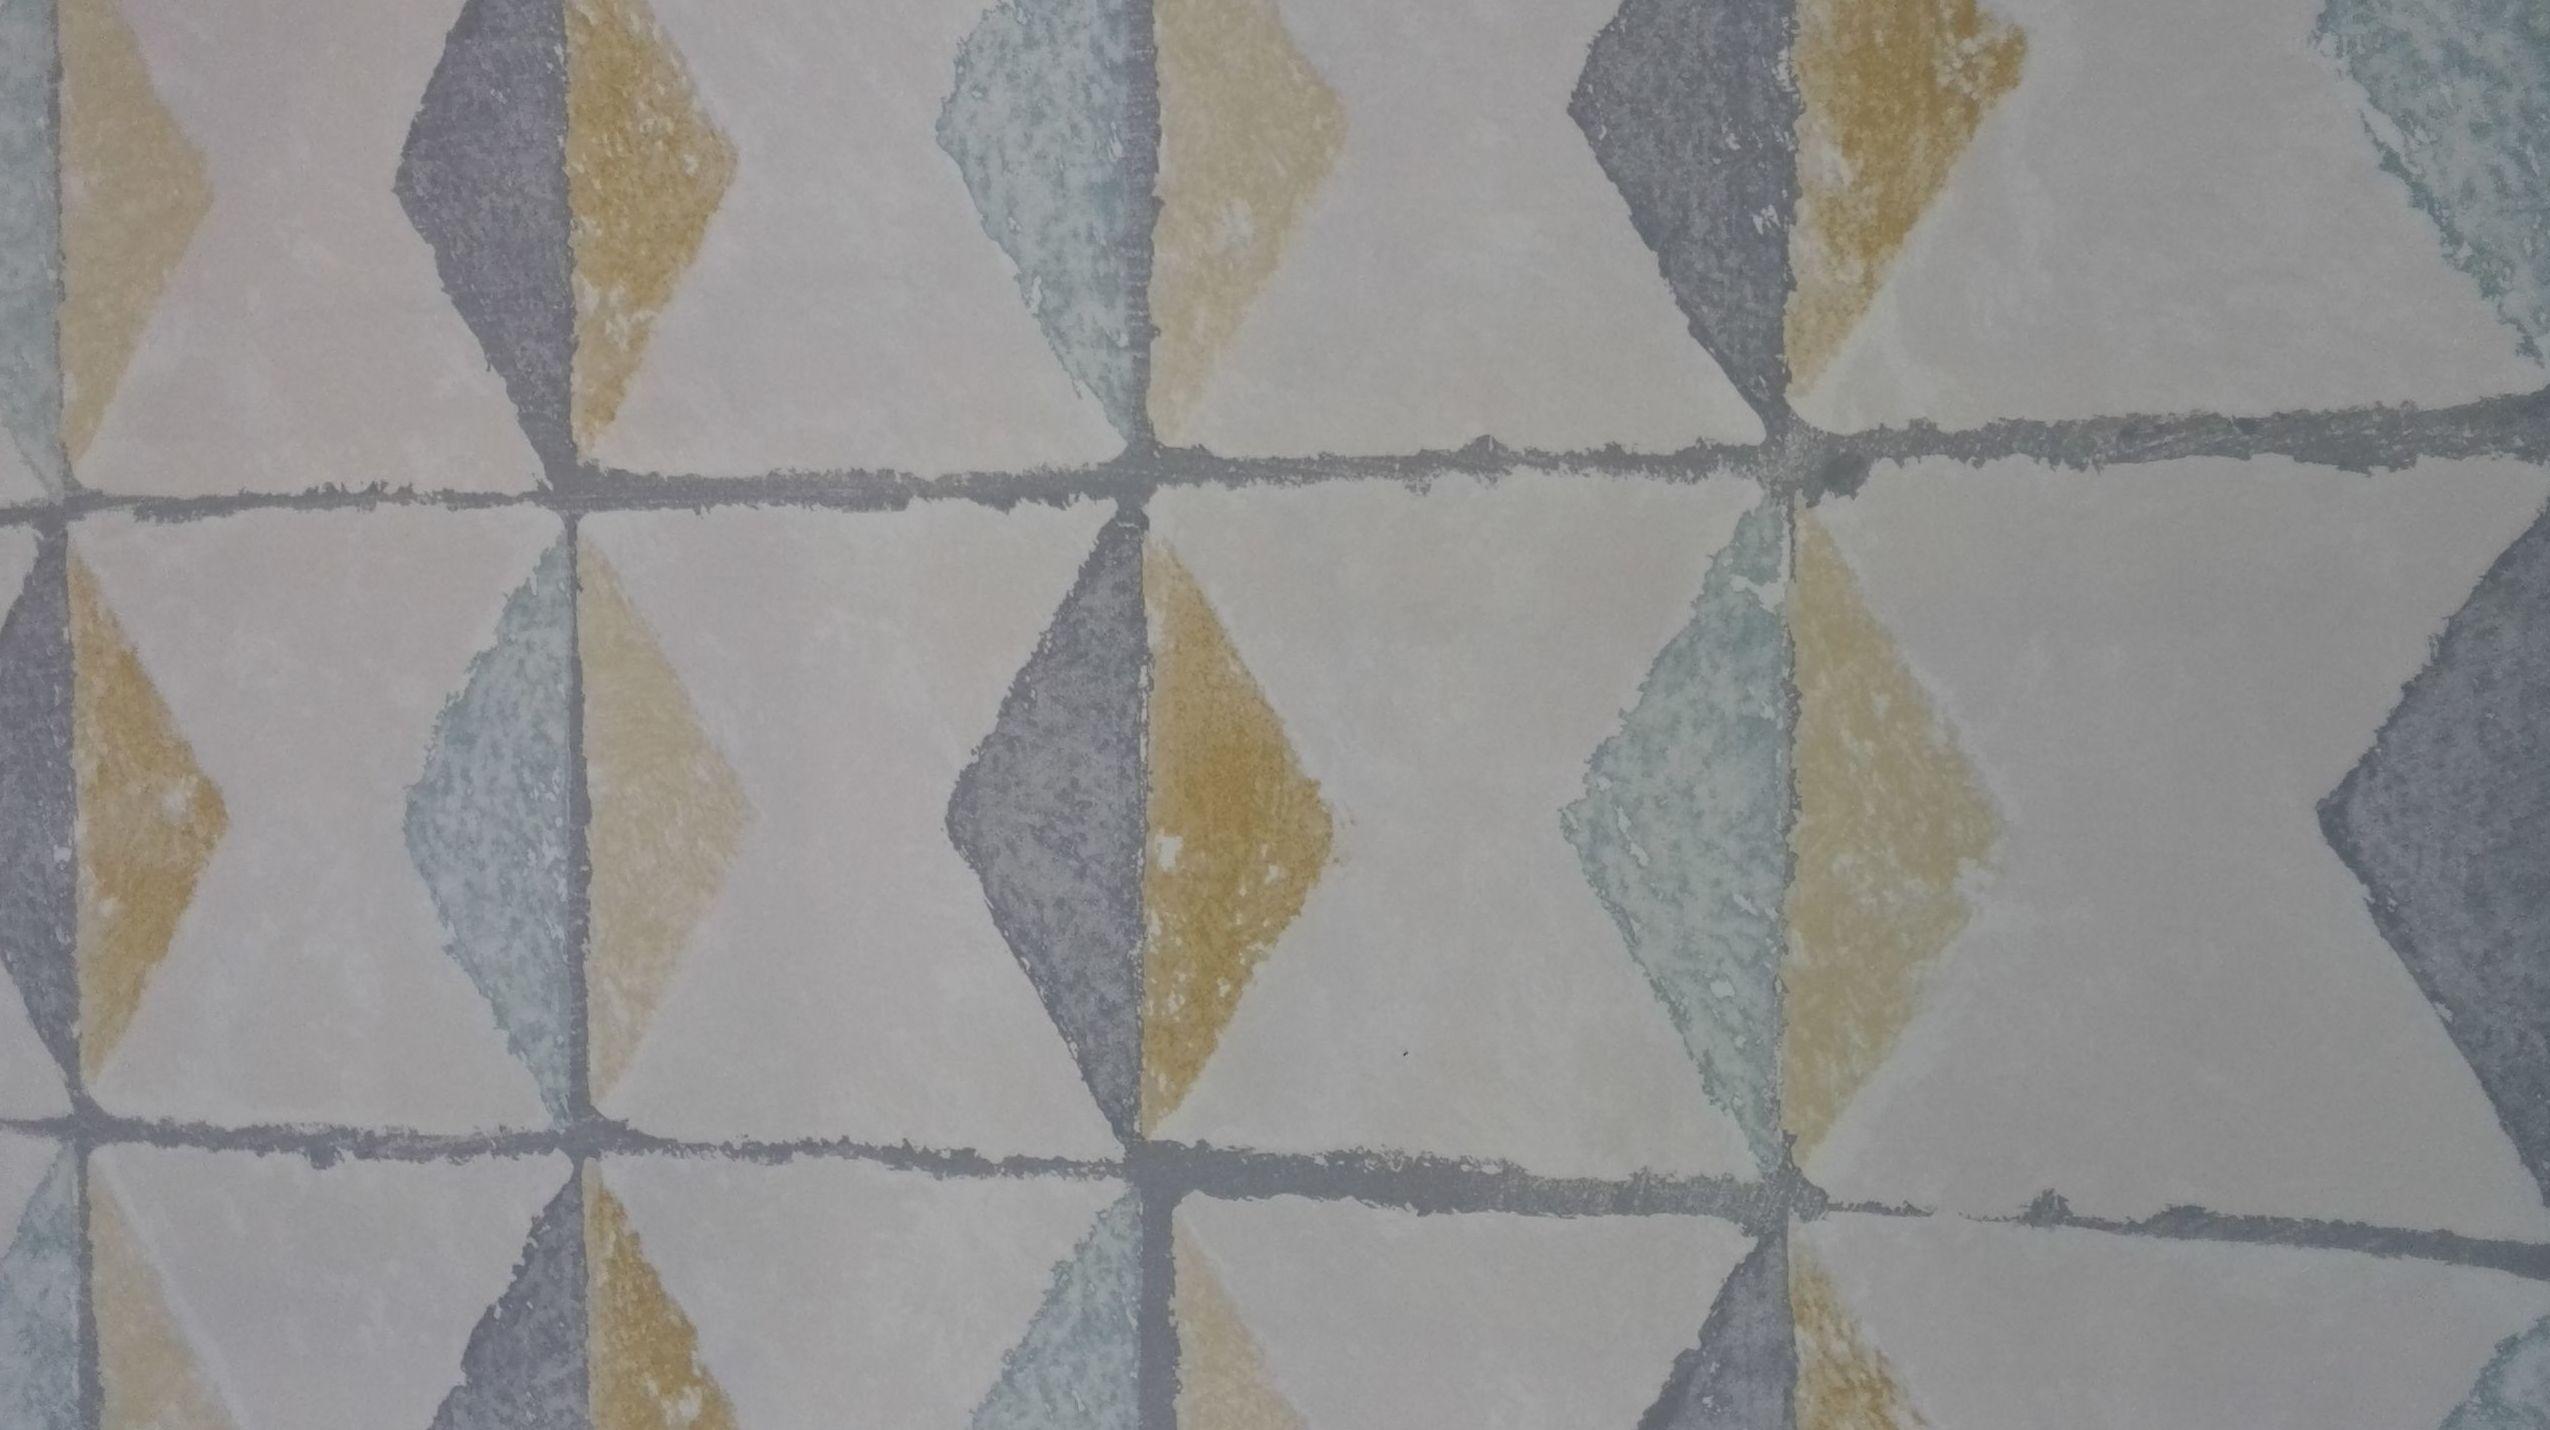 Foto 16 de Decoración textil en Madrid | Diseño Textil